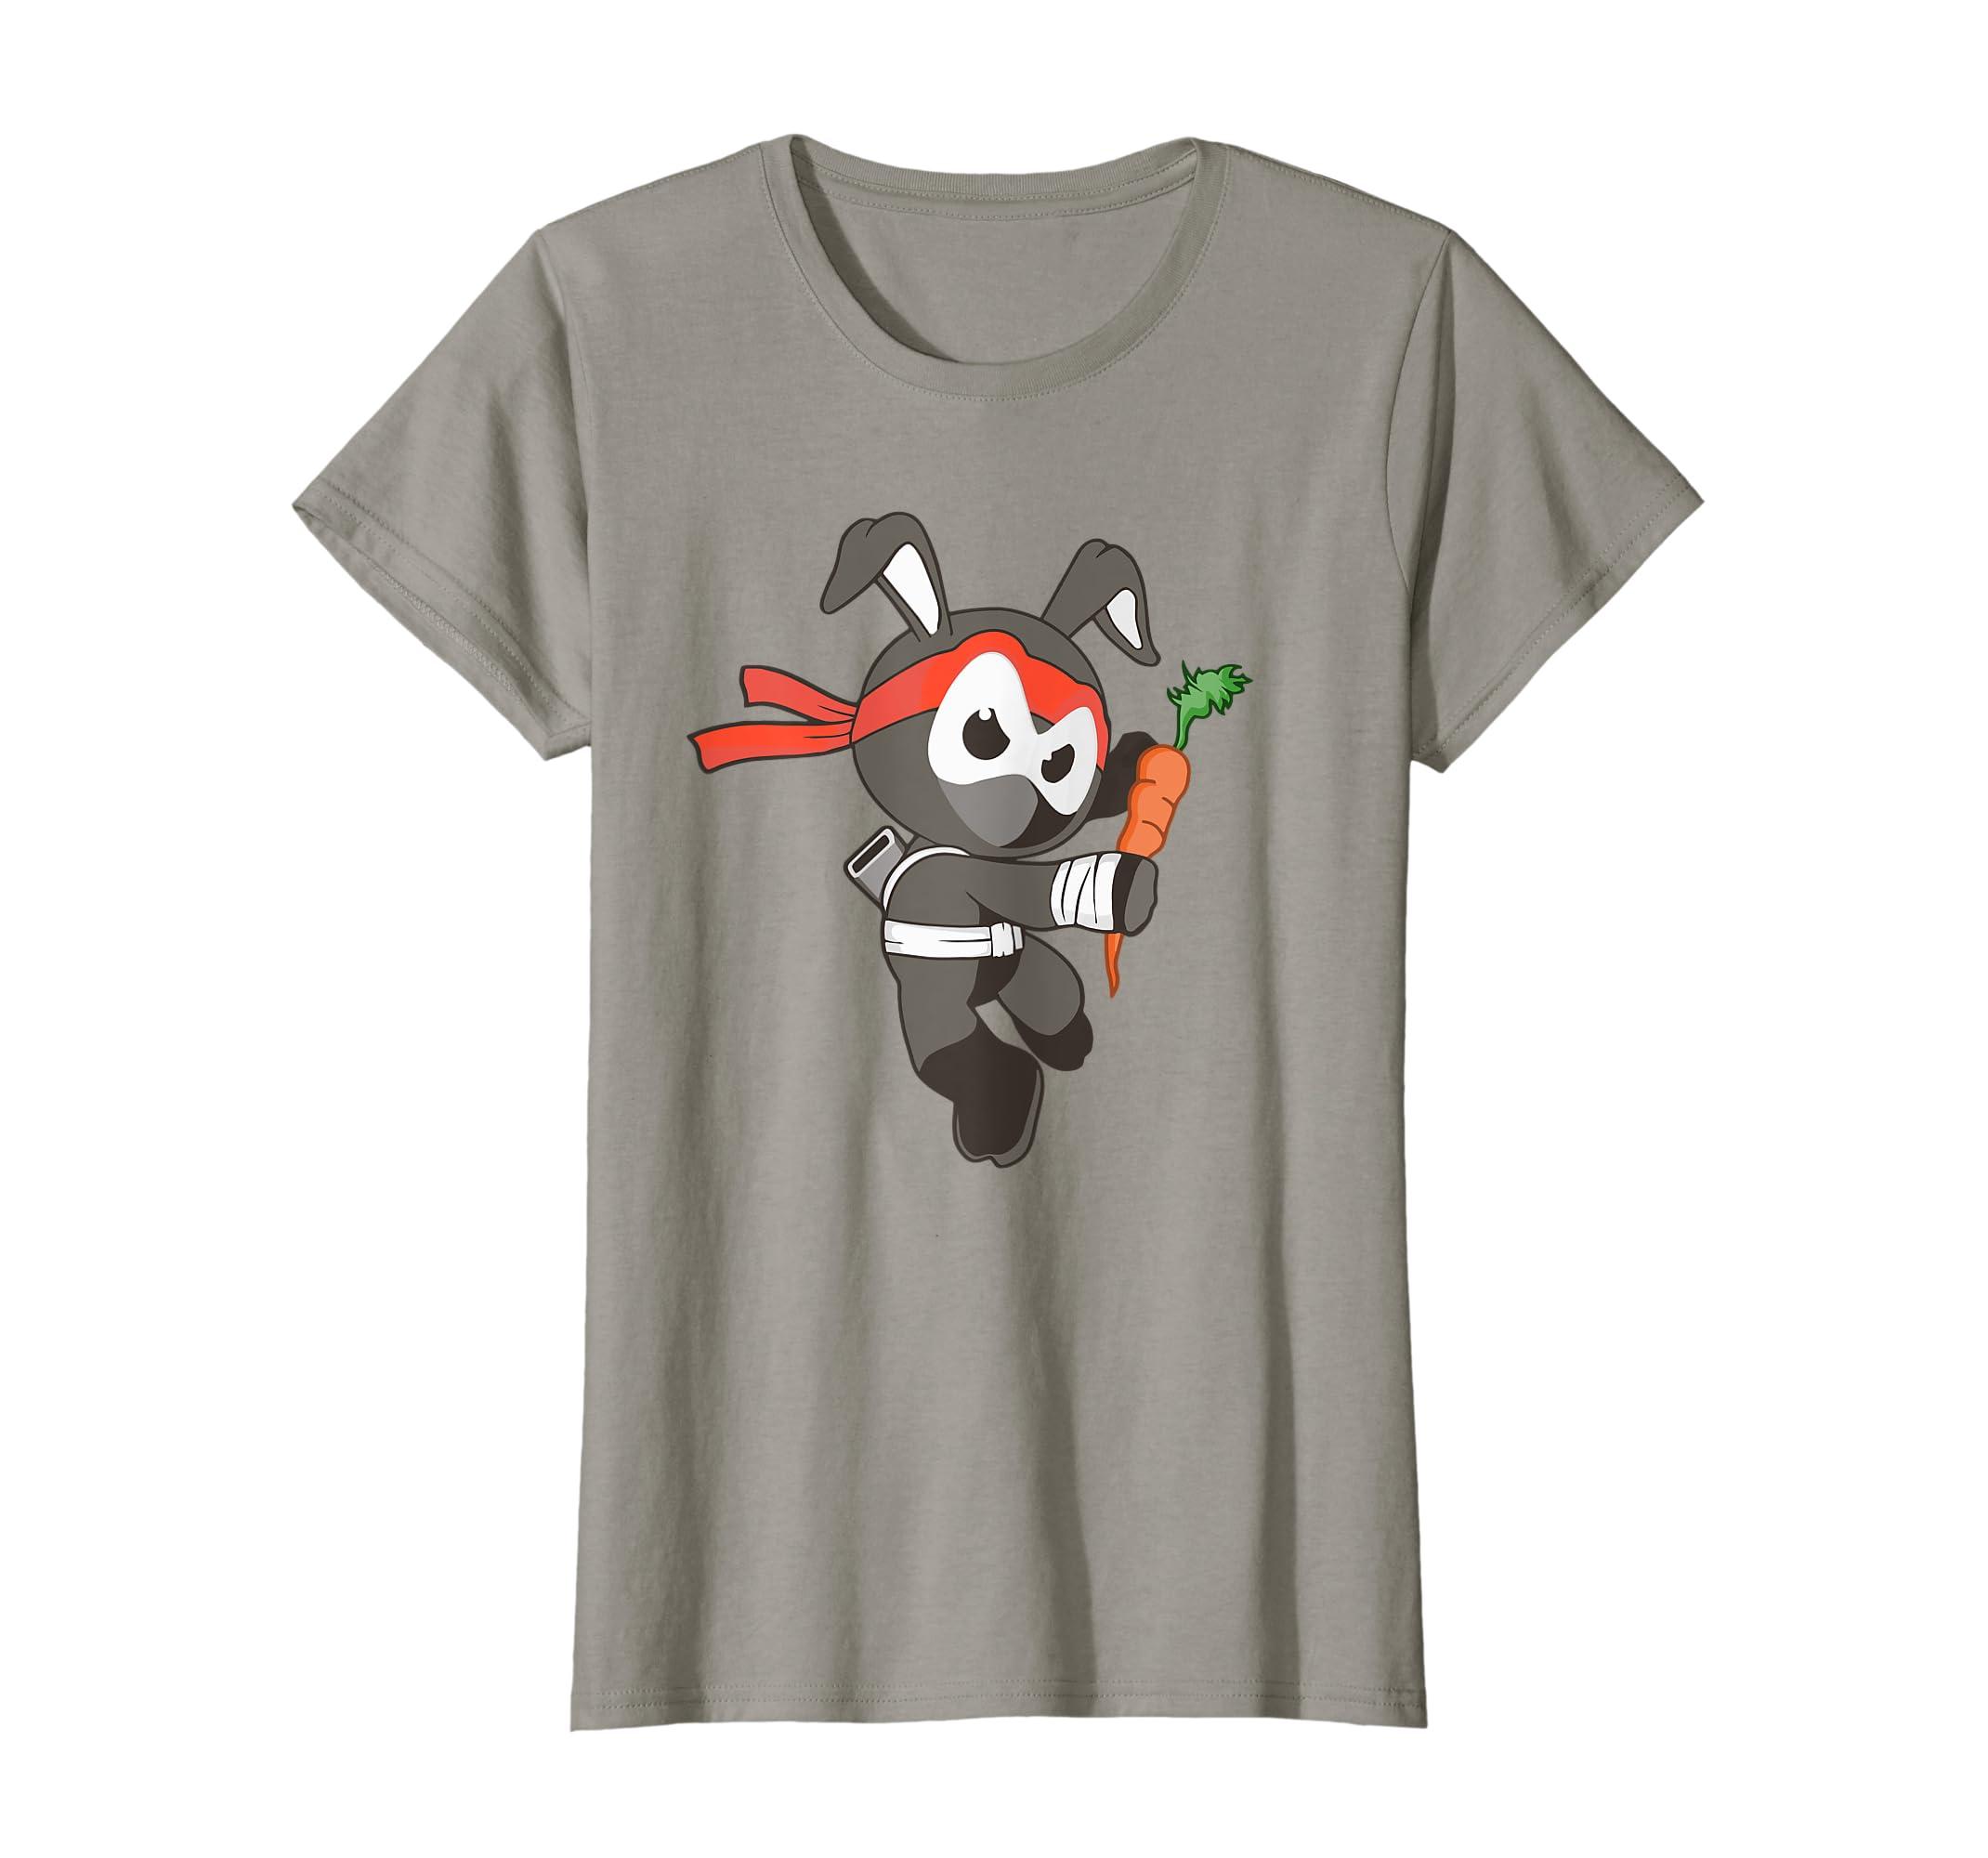 Amazon.com: Ninja Rabbit Shirt, Fun Martial Arts Bunny Tee ...